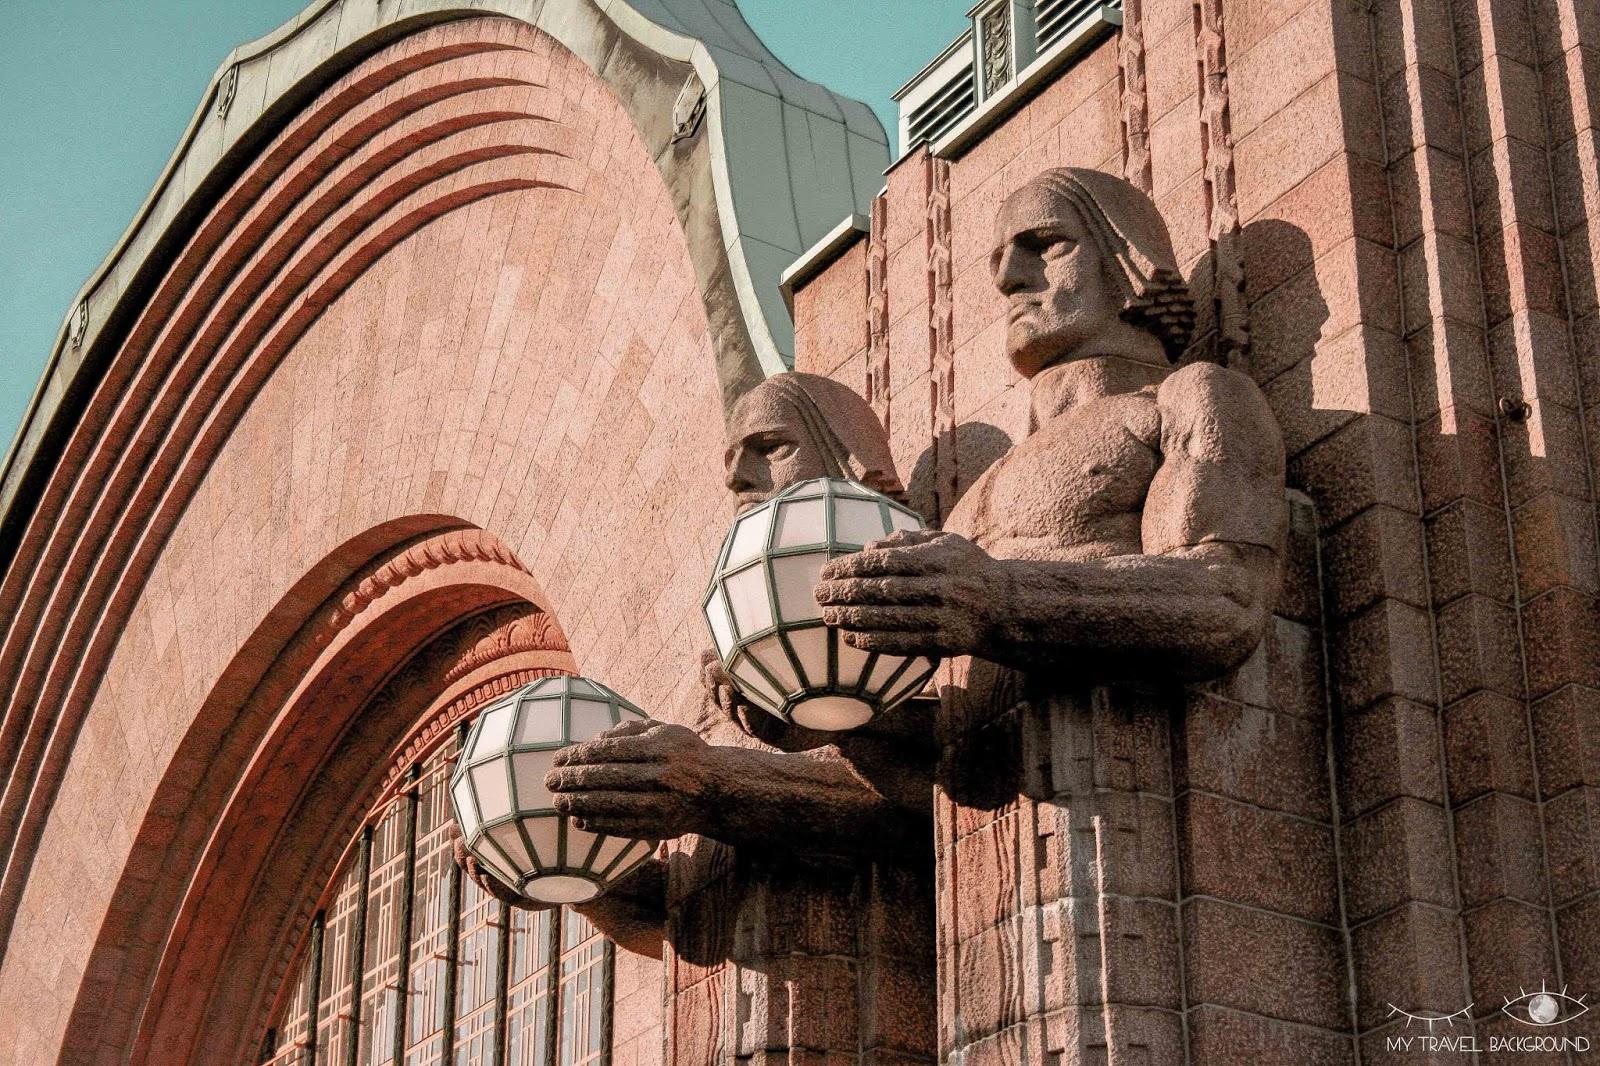 My Travel Background : 2 jours pour découvrir Helsinki, la capitale de la Finlande - Gare d'Helsinki